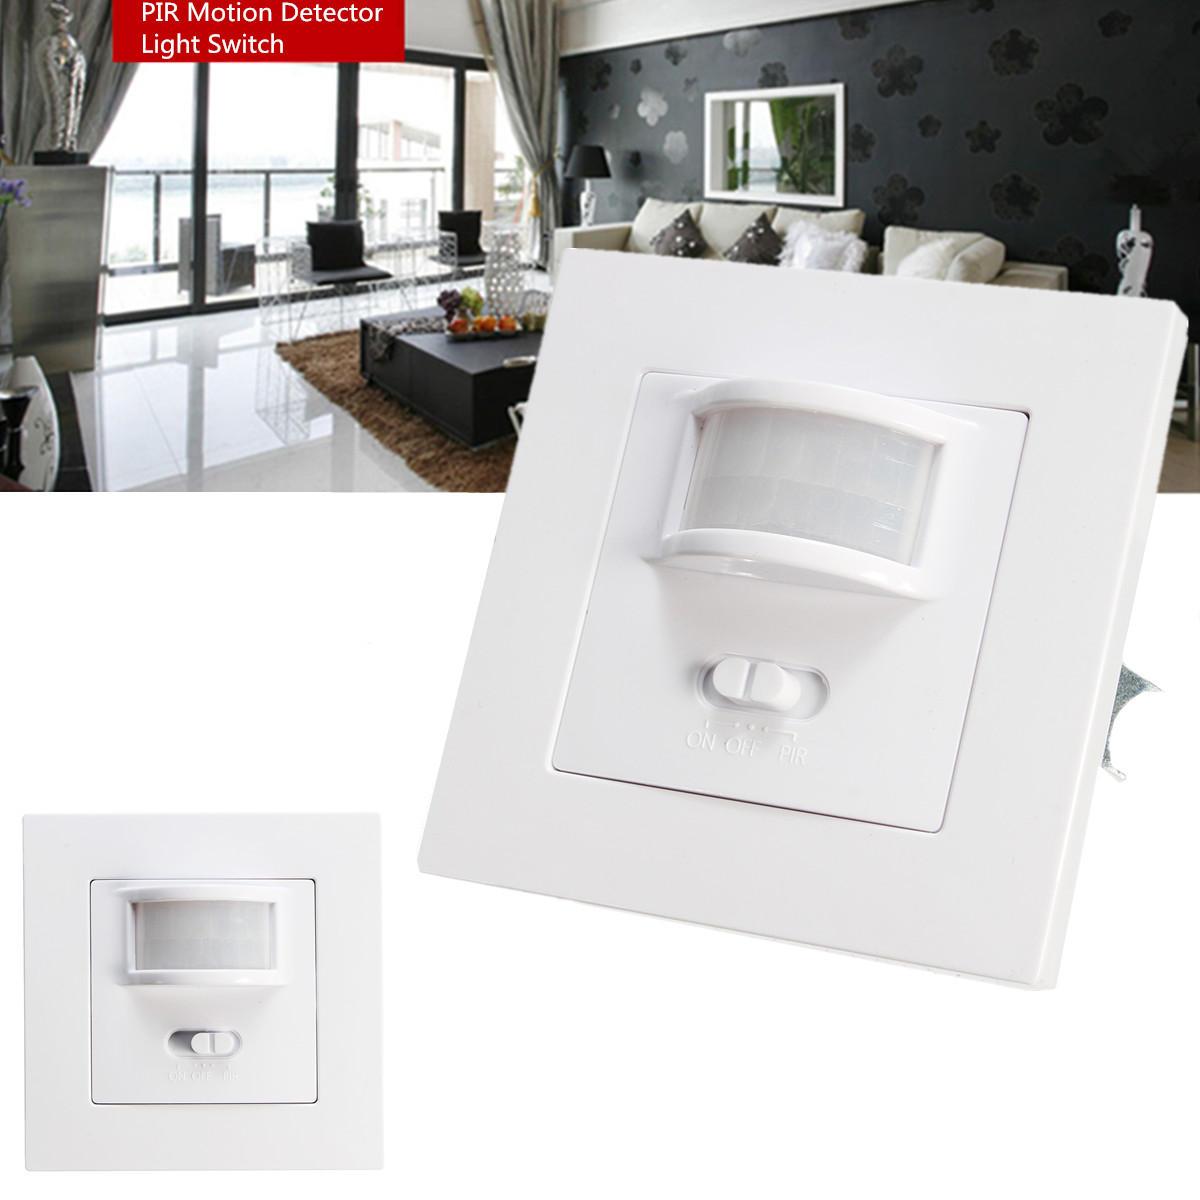 140 Degree Infrared PIR Motion Sensor Recessed Wall Lamp Bulb LED Strip Light Switch AC220-240V